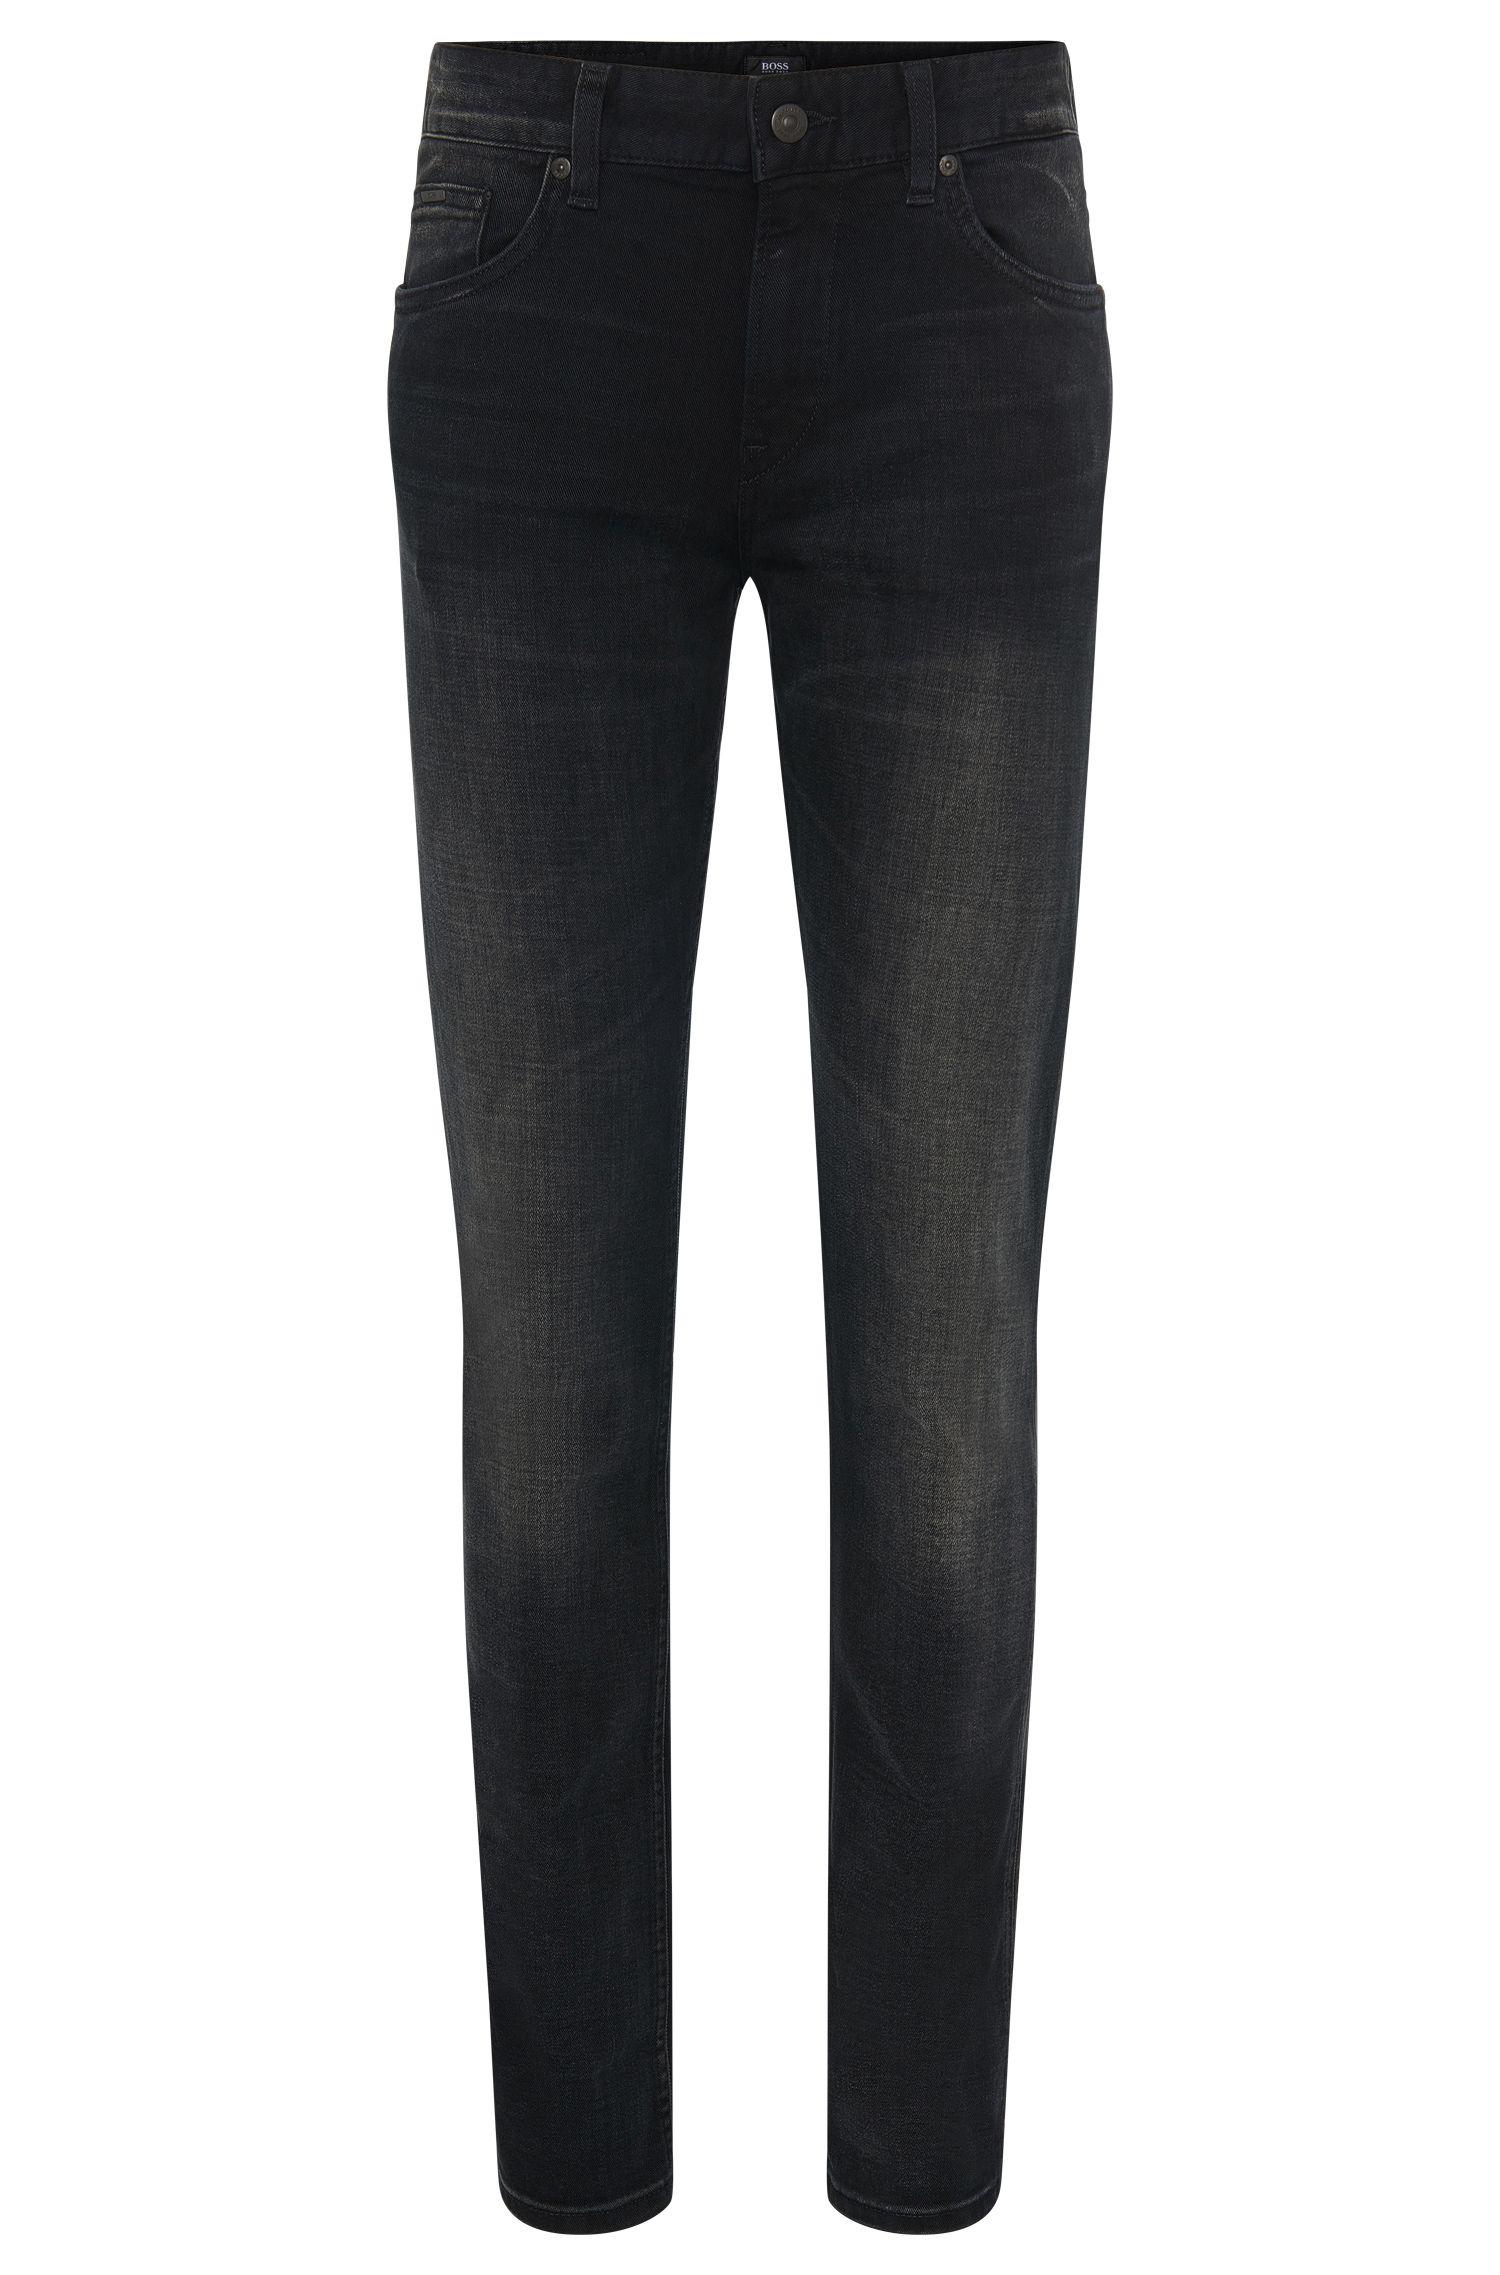 'Delaware' | Slim Fit, 10 oz Stretch Cotton Blend Jeans